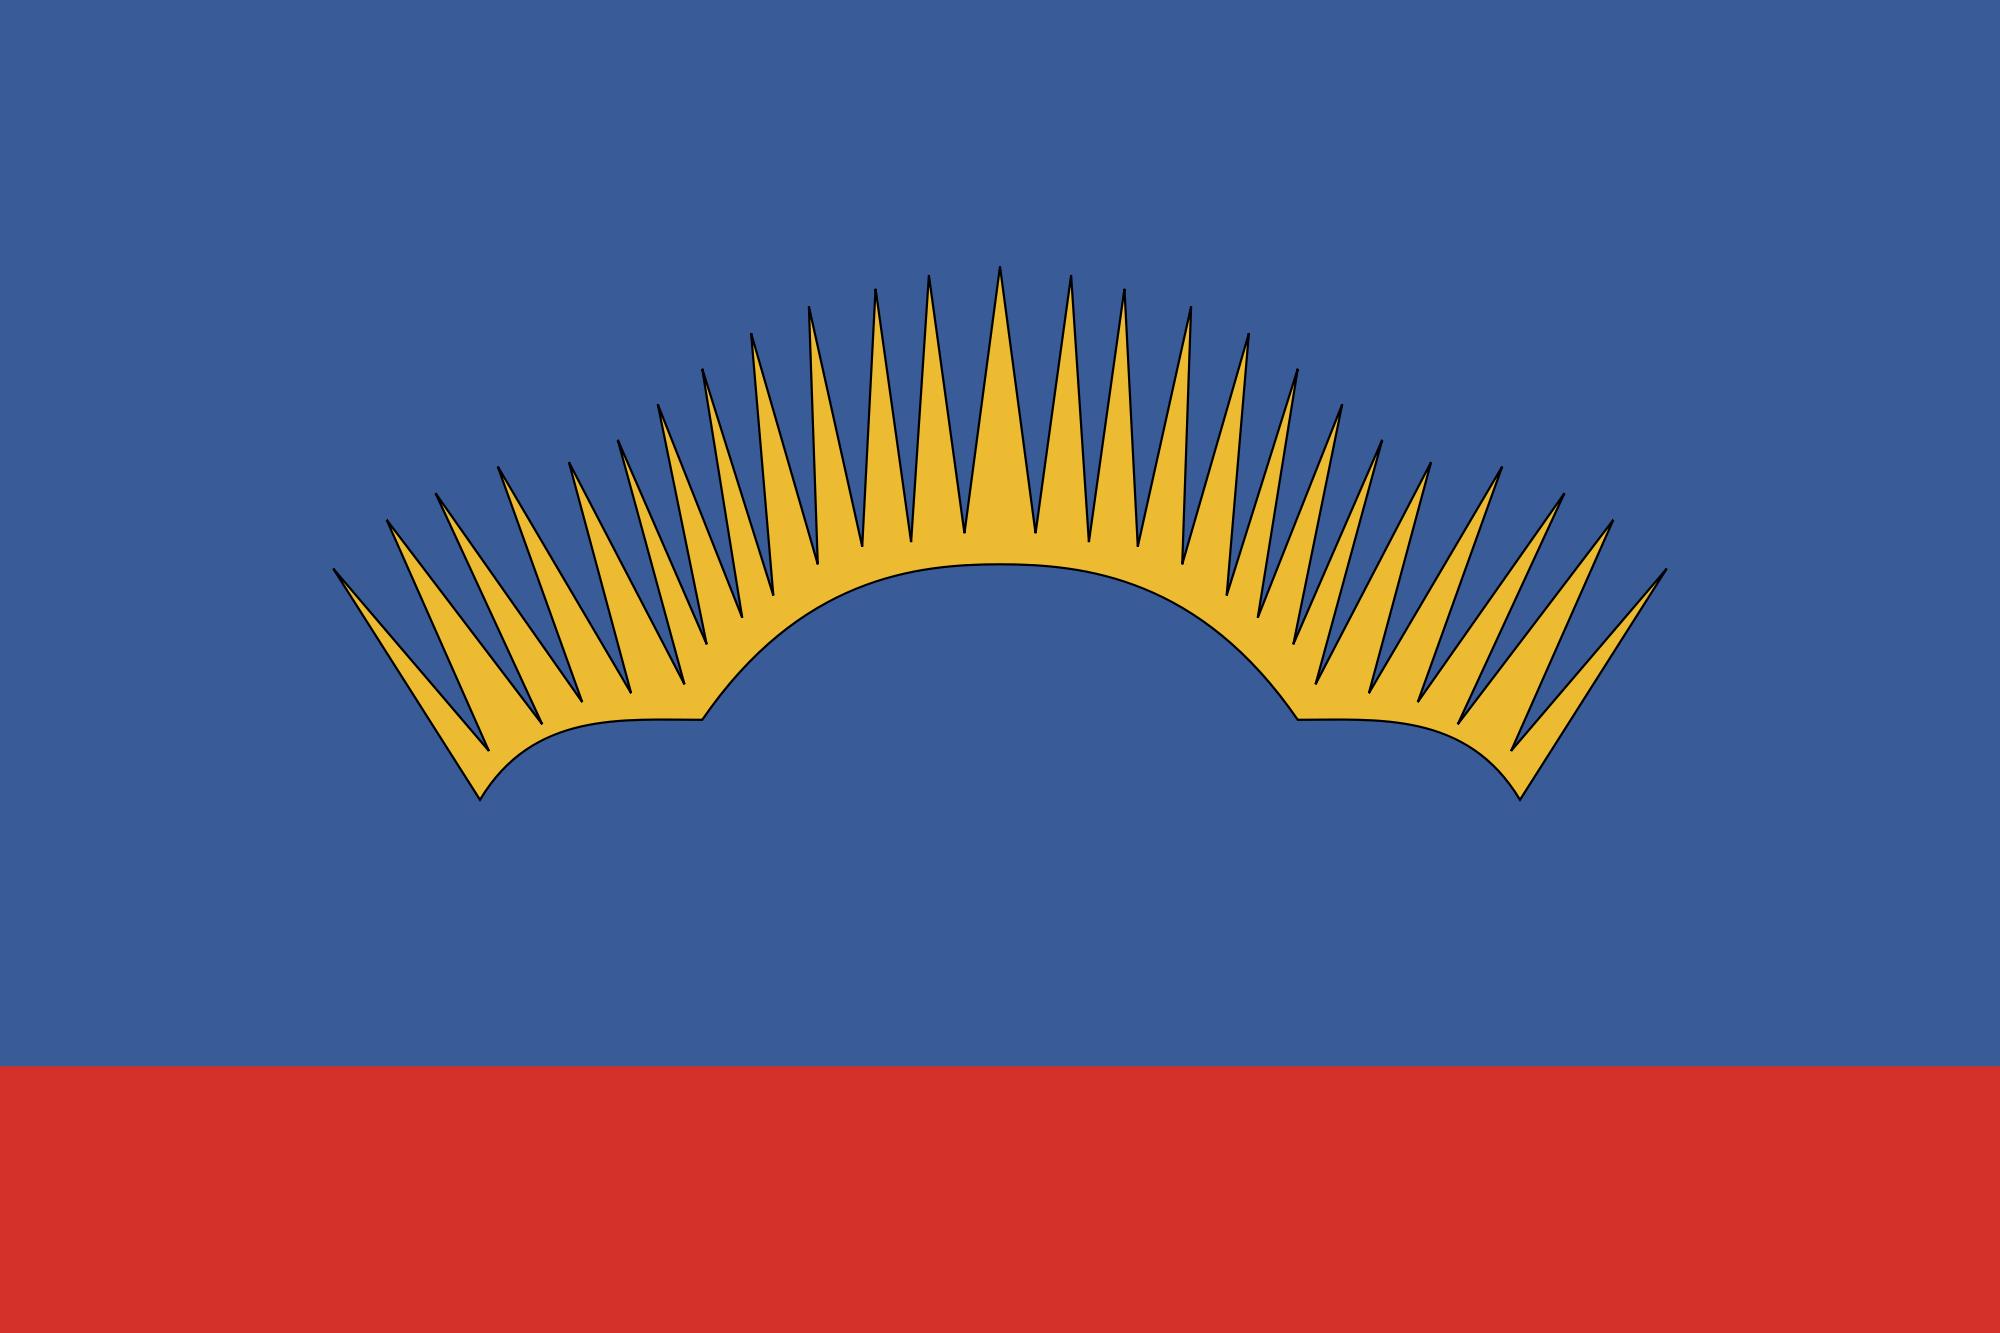 Murmanks Oblast With Stylized Aurora Borealis Flag Karta Mir